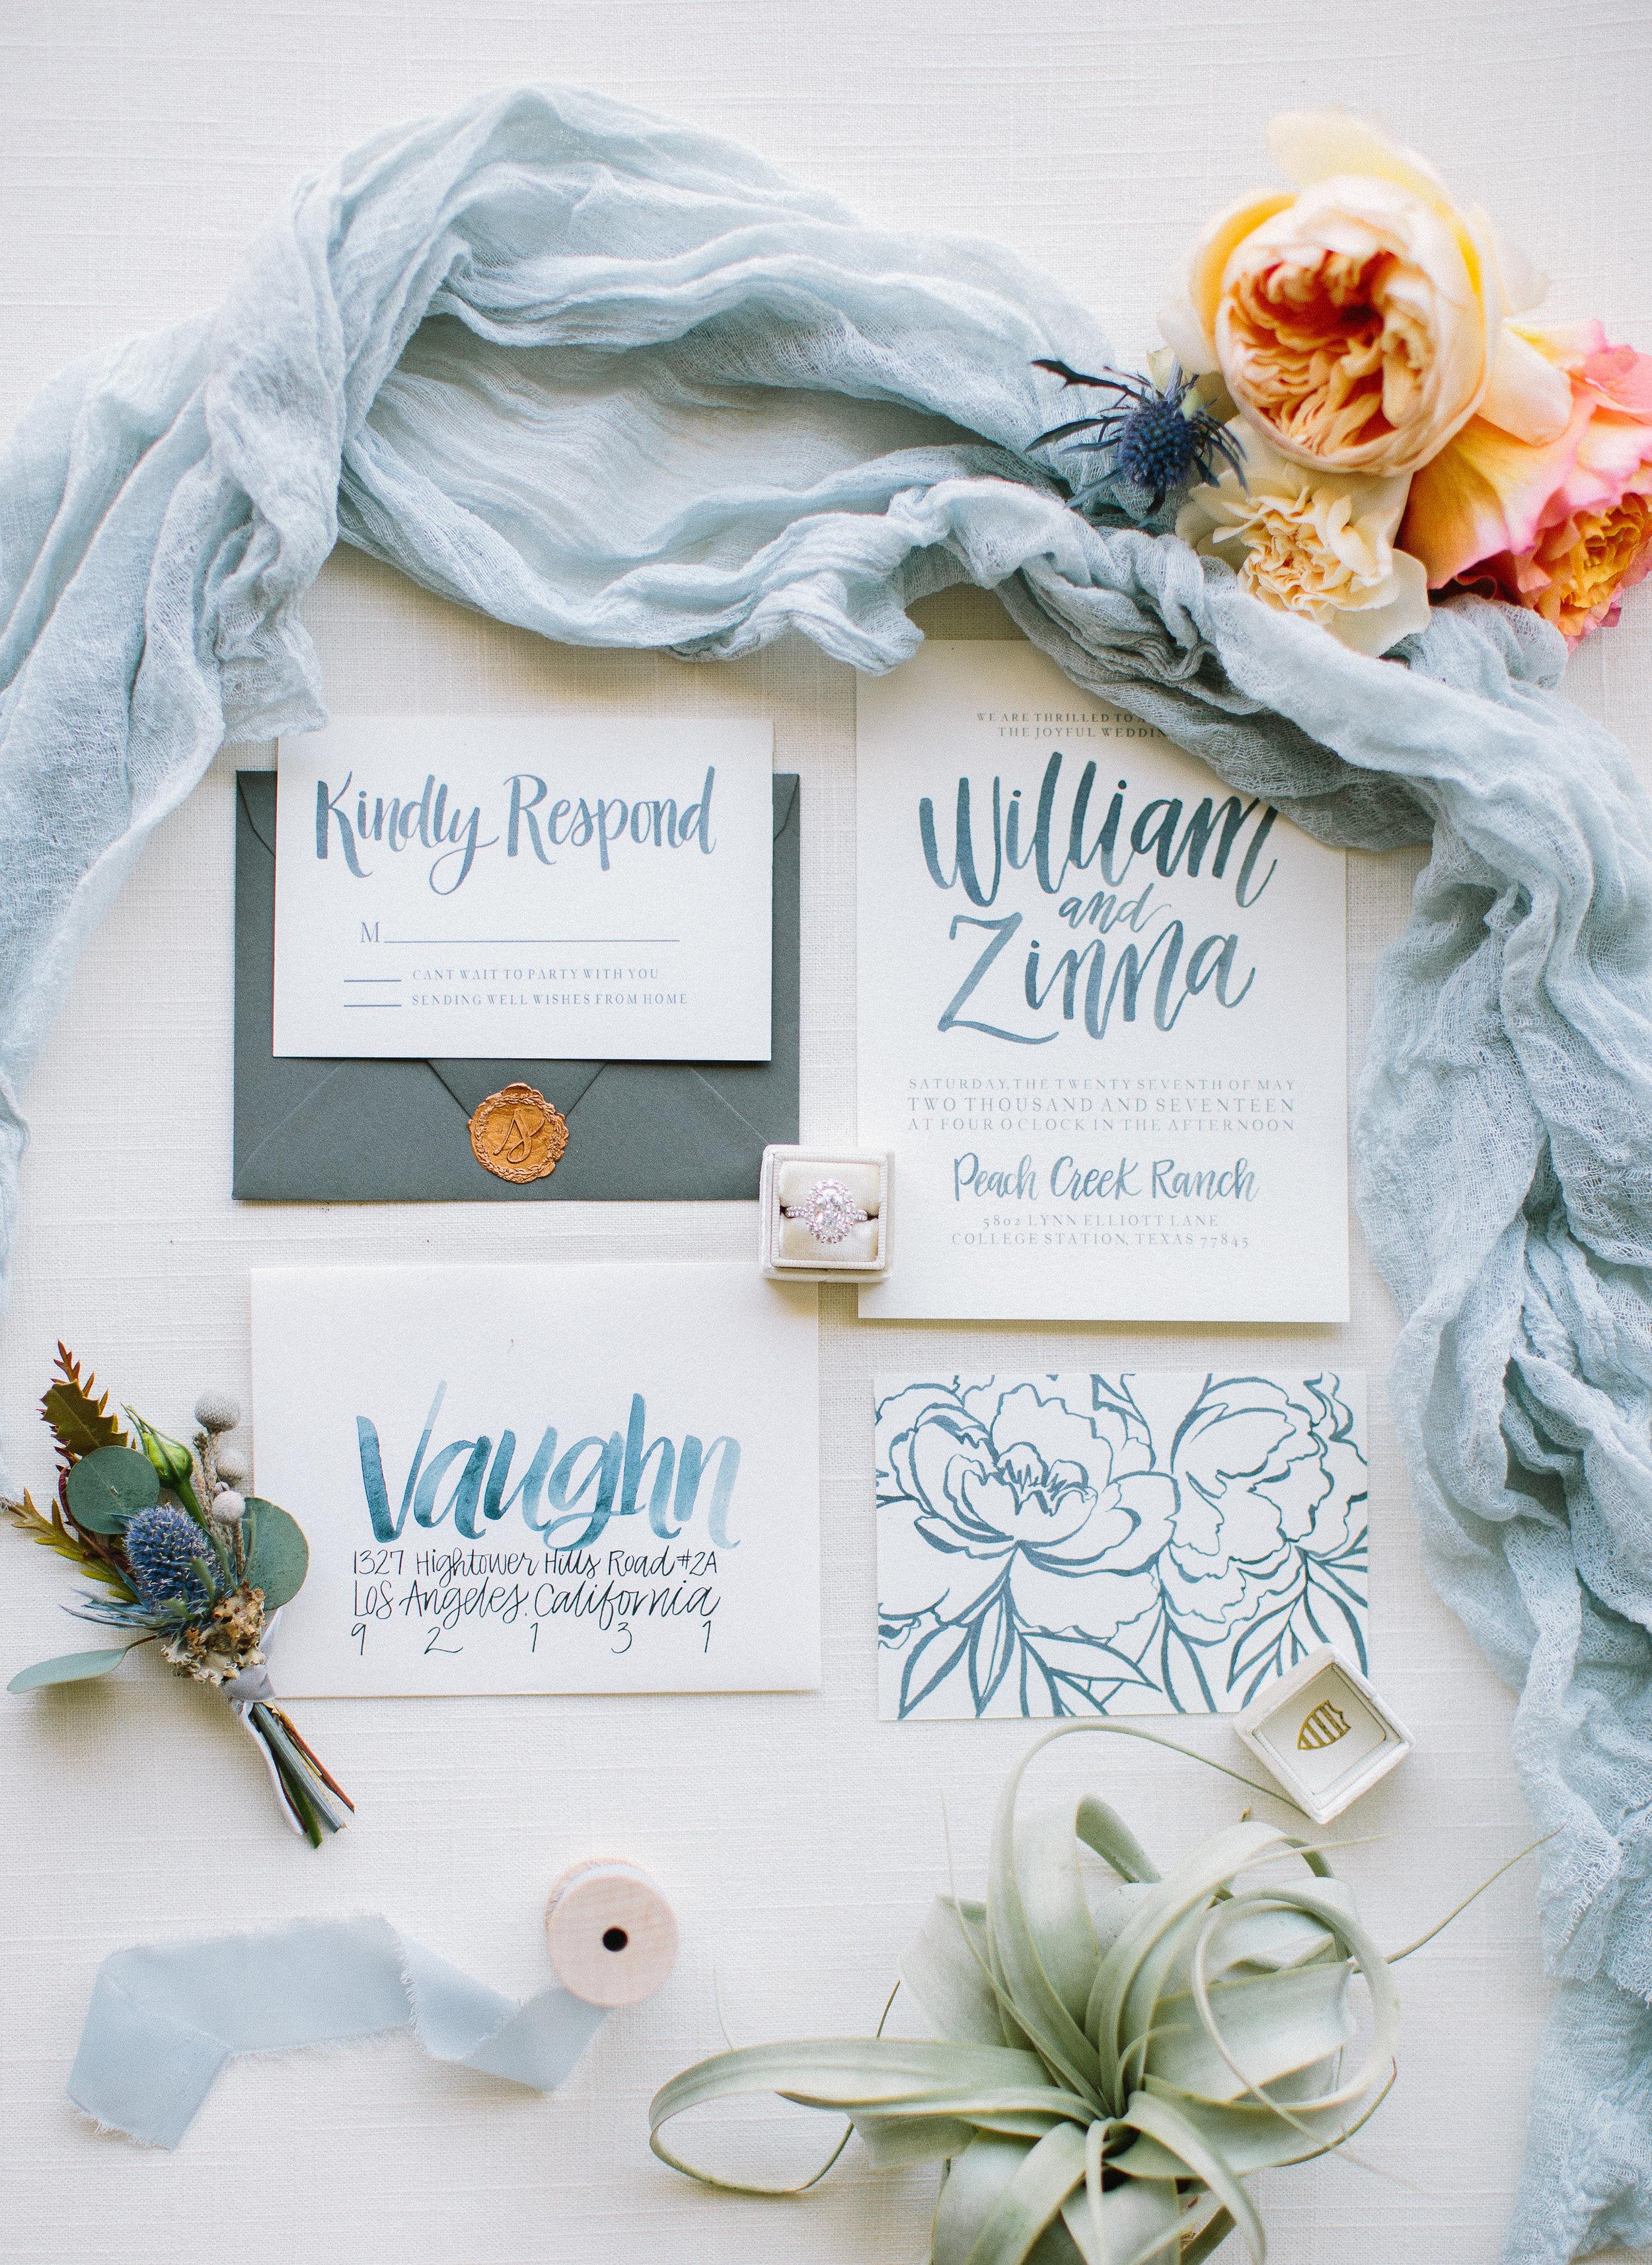 Ellen-Ashton-Photography-Peach-Creek-Ranch-Weddings-Wed-and-Prosper5.jpg